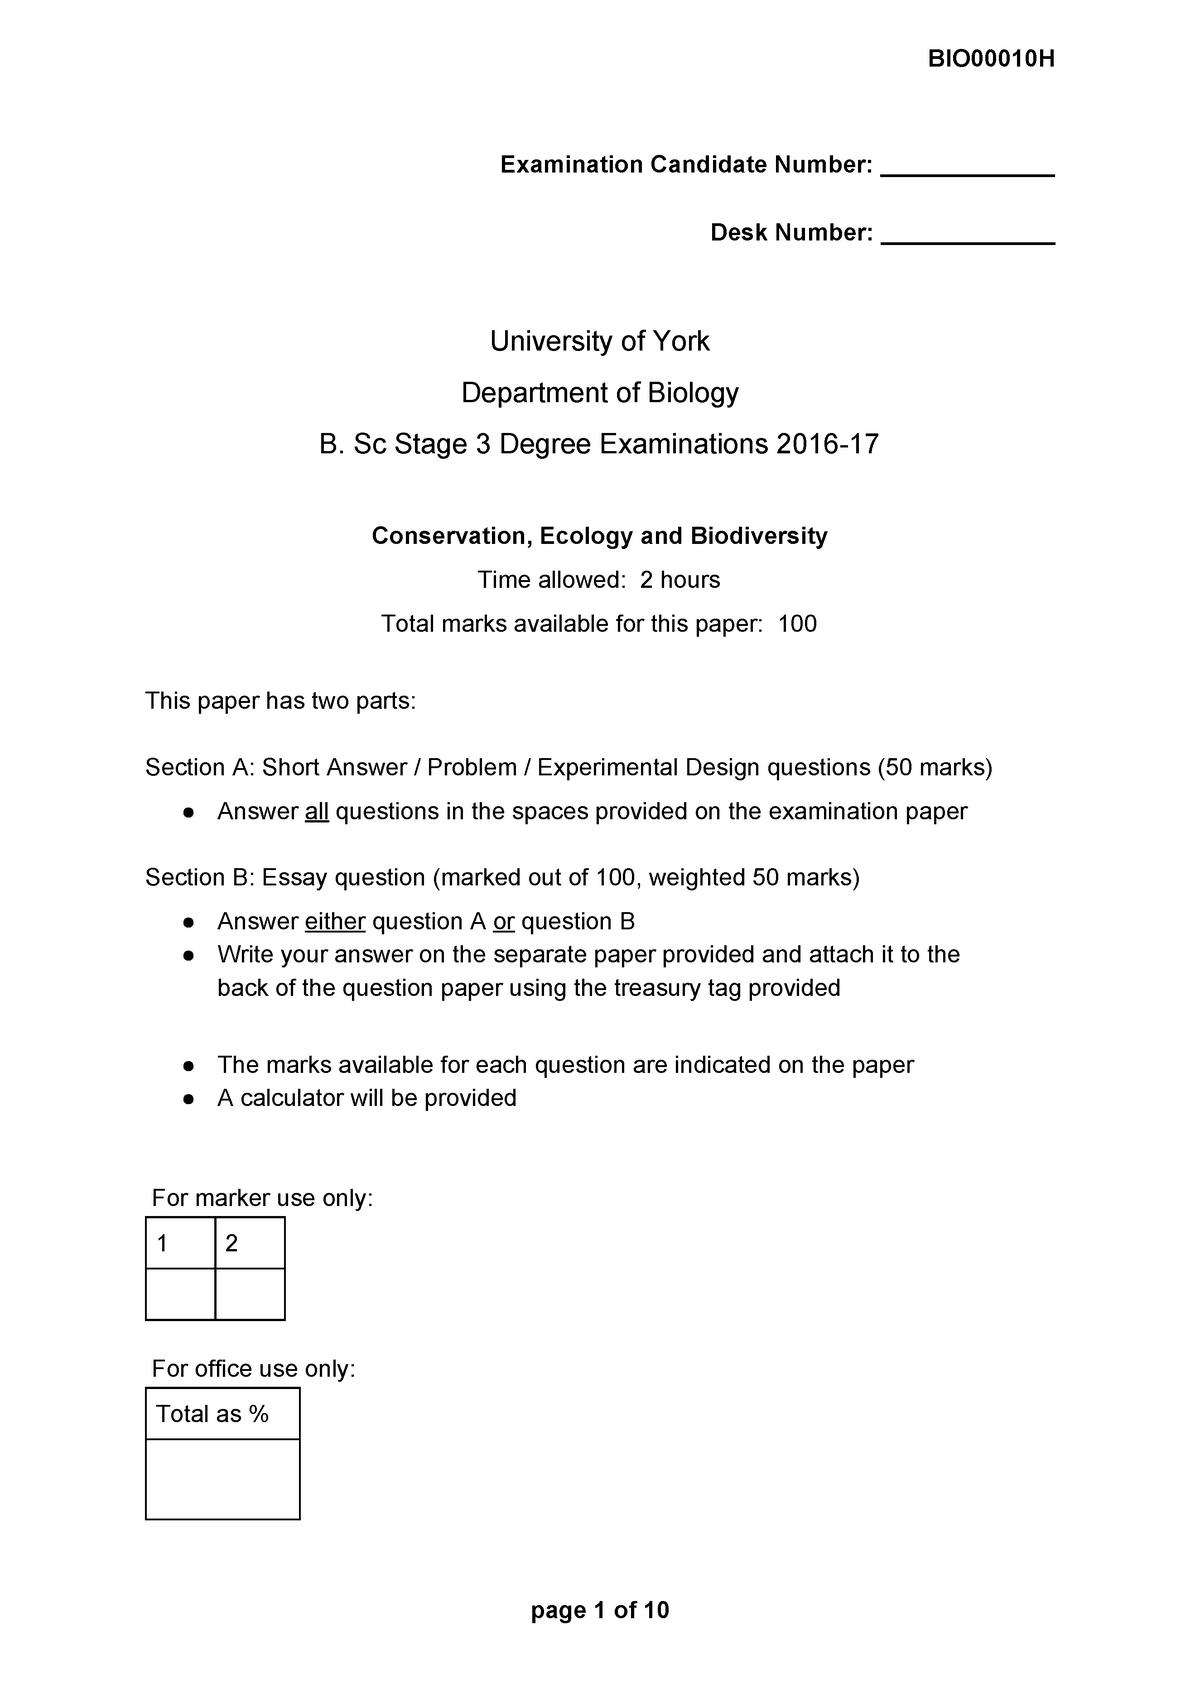 Exam 2017 - BIO00010H: Conservation, Ecology & Biodiversity - StuDocu